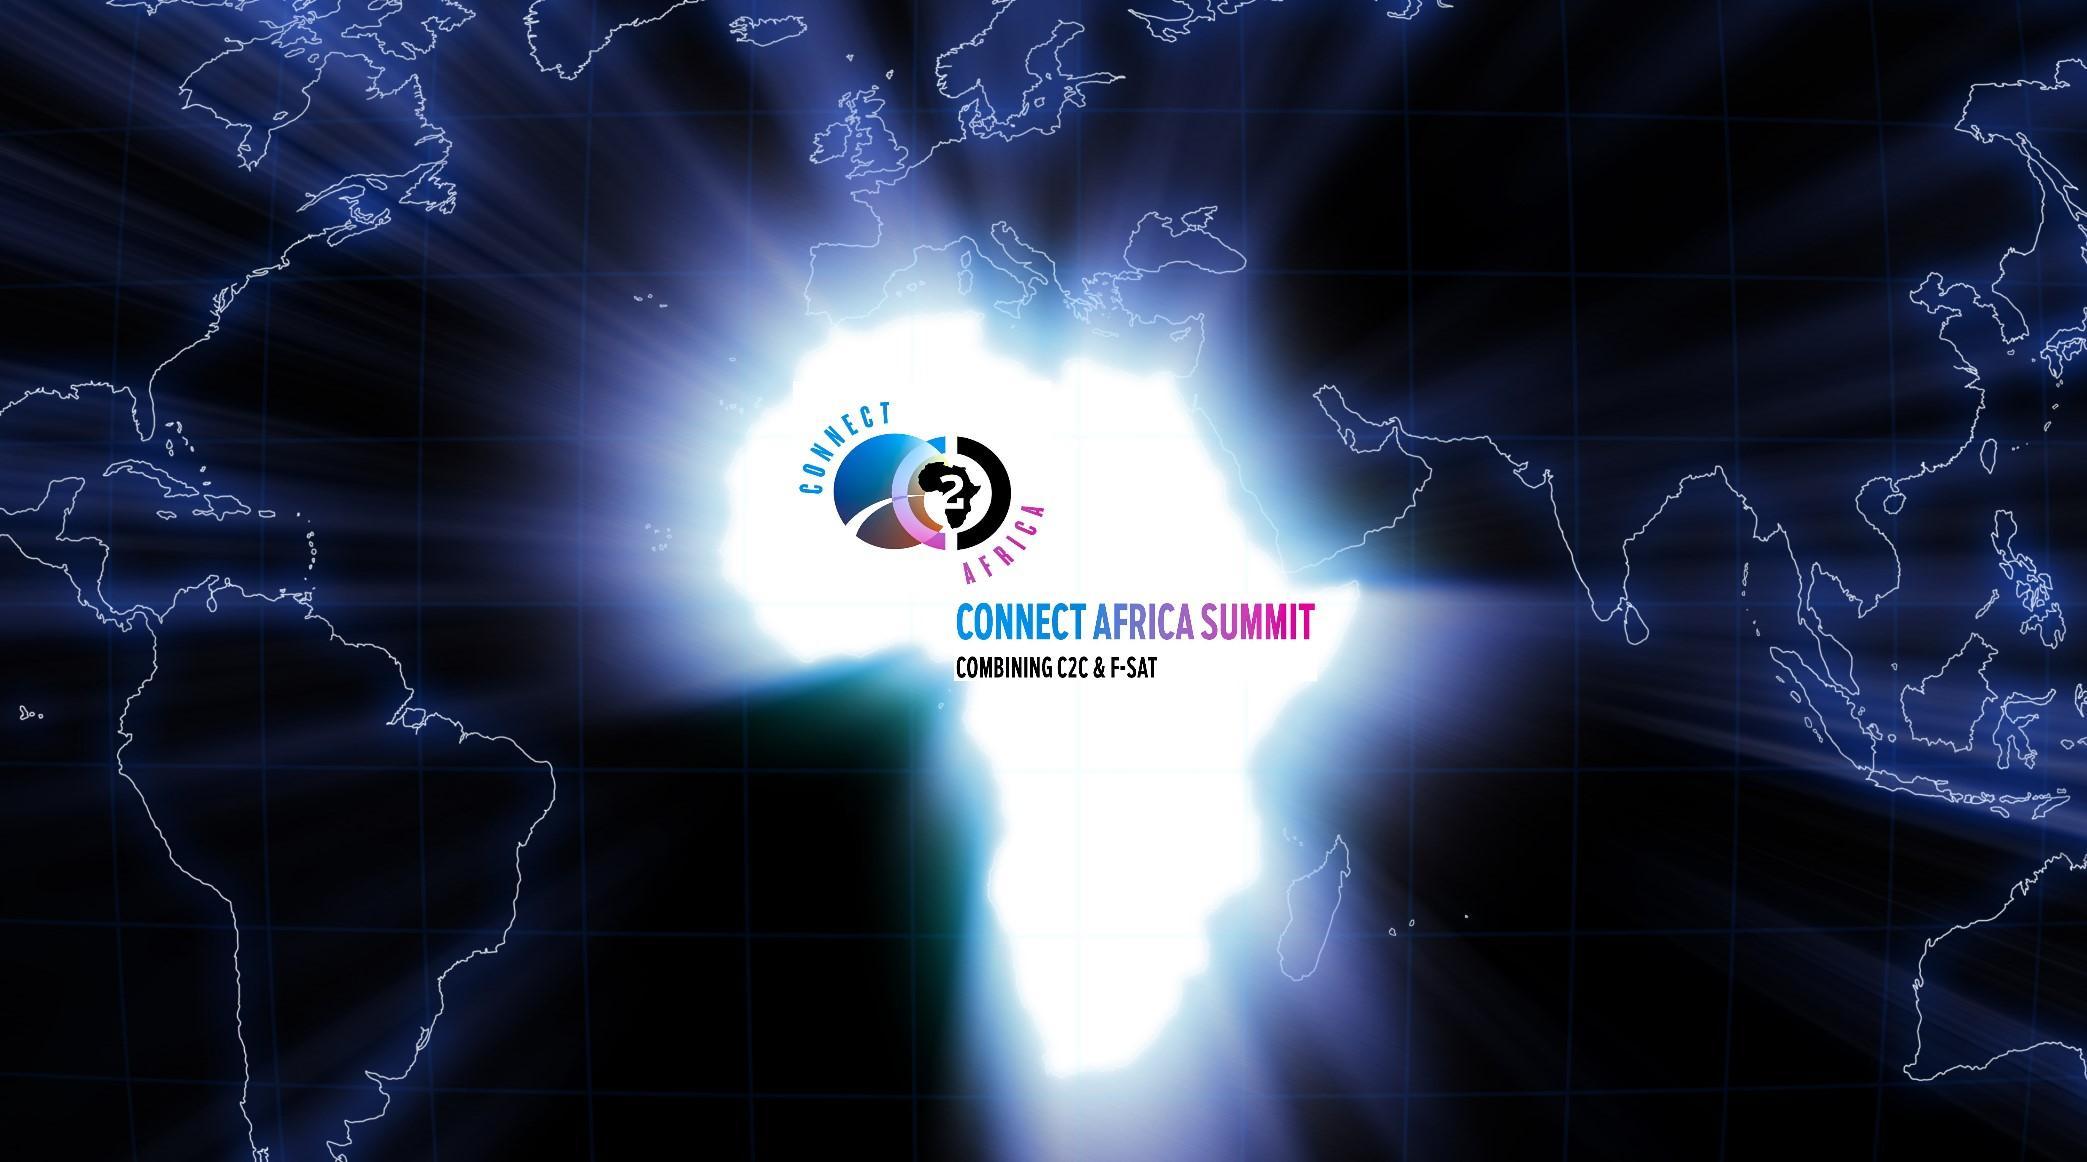 Connect Africa, 11-12 Sept 2018 – Combining C2C & F-SAT Africa